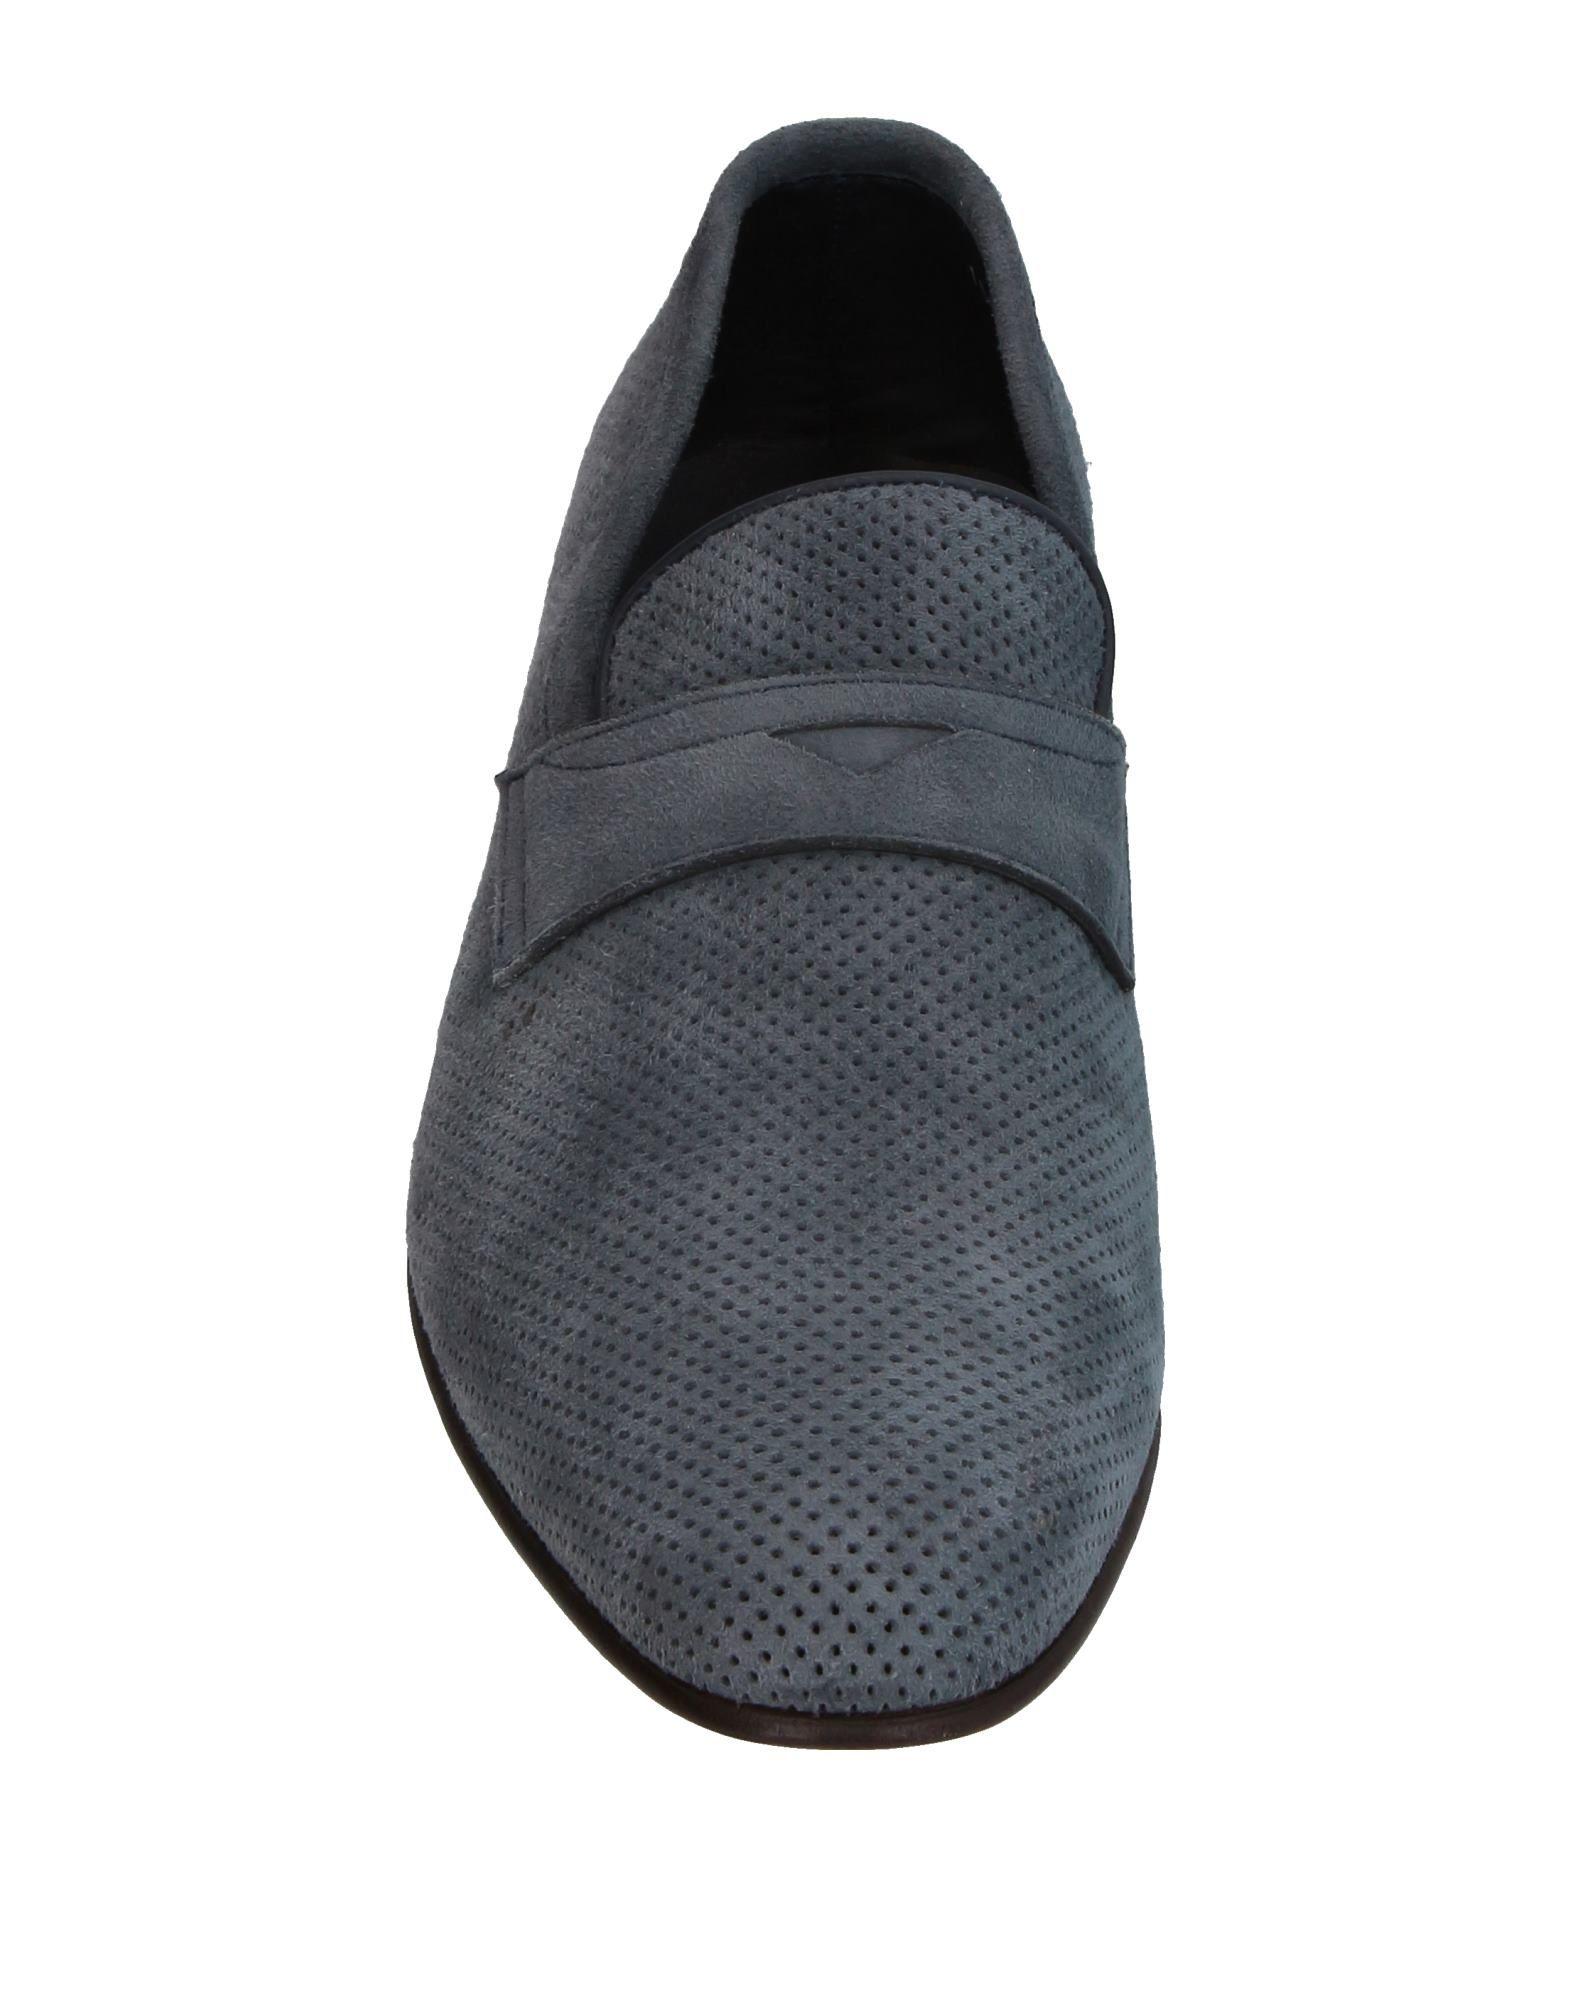 Santoni Mokassins 11409727QV Herren  11409727QV Mokassins Heiße Schuhe 2b9442